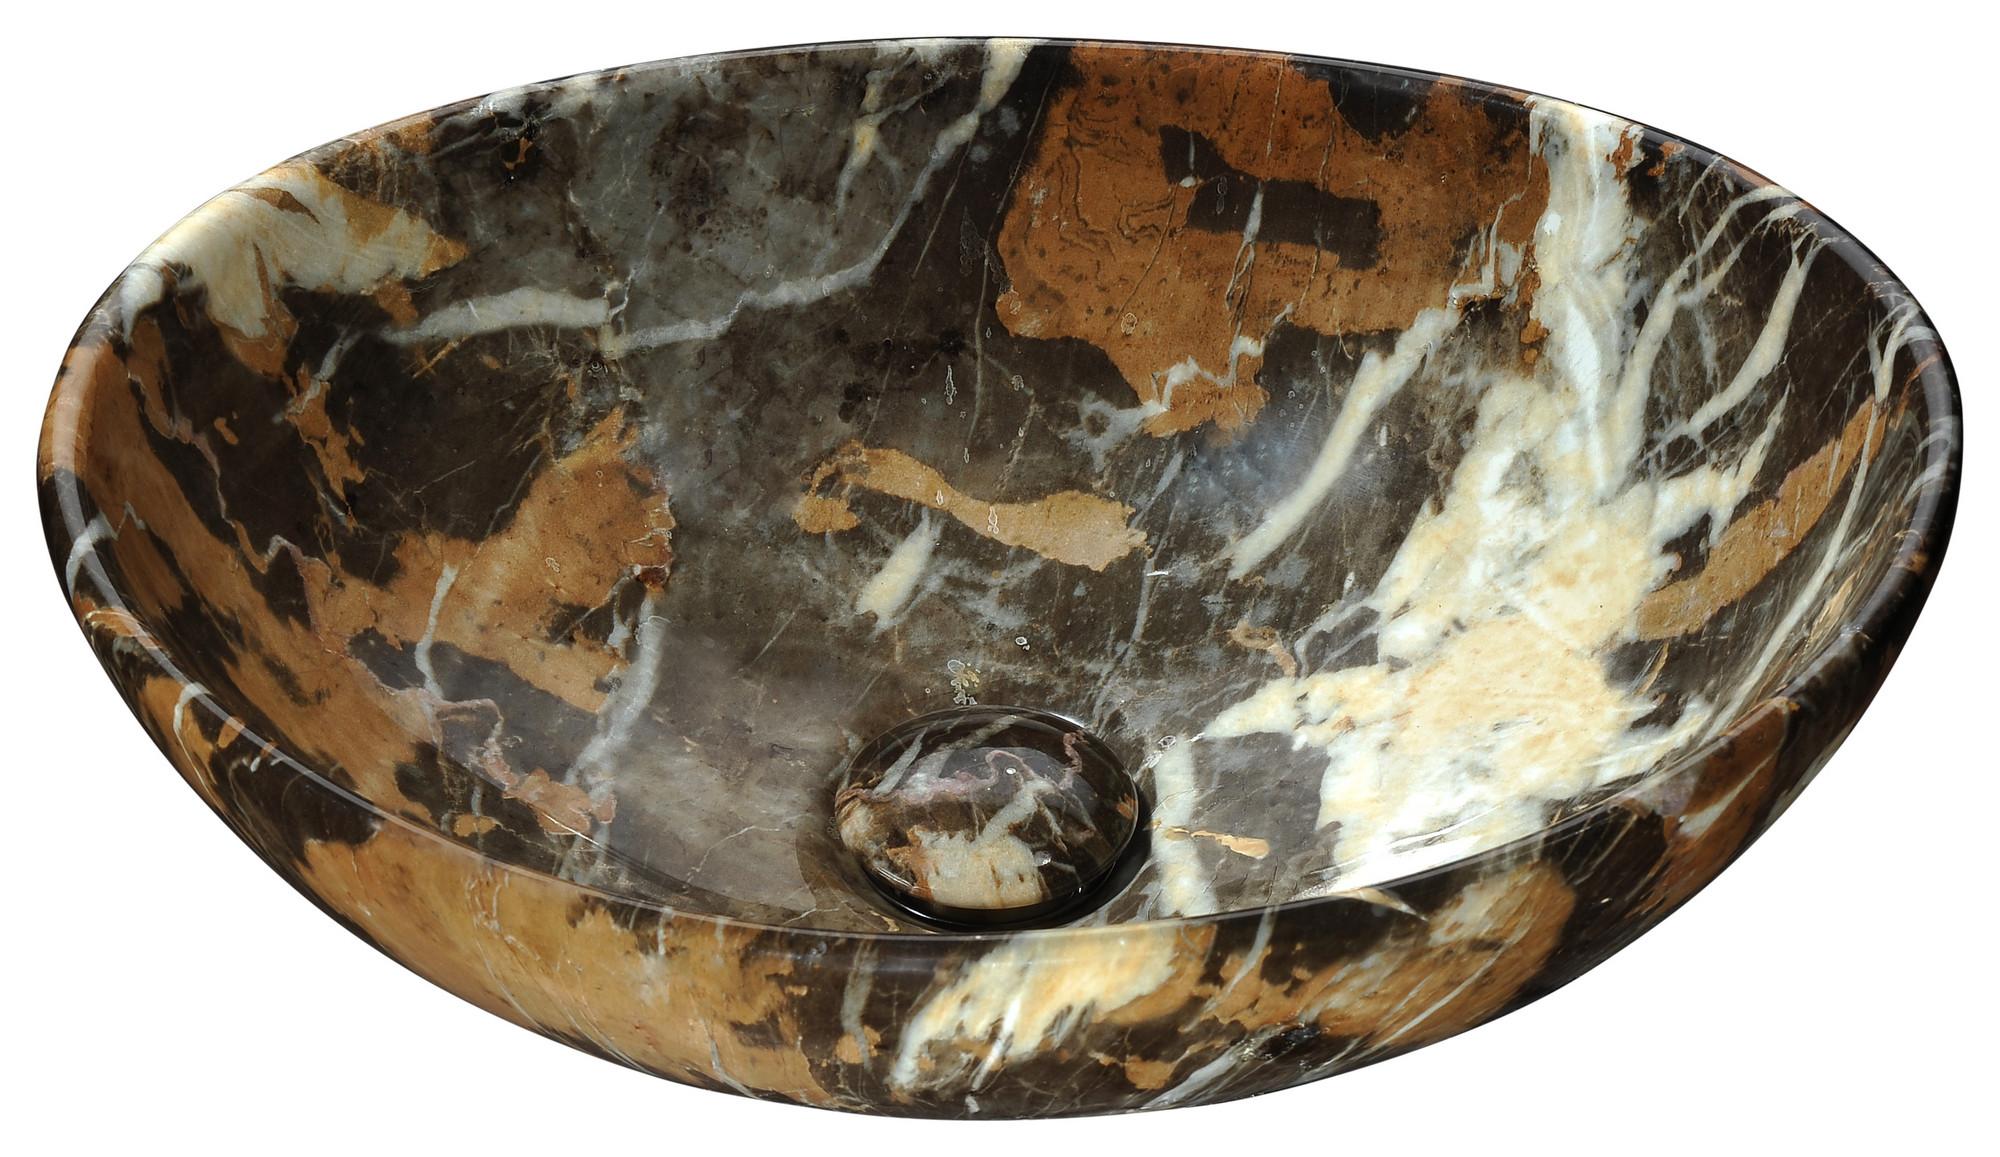 ANZZI LS-AZ279 Sona Vitreous China Ceramic Vessel Sink In Marbled Adobe